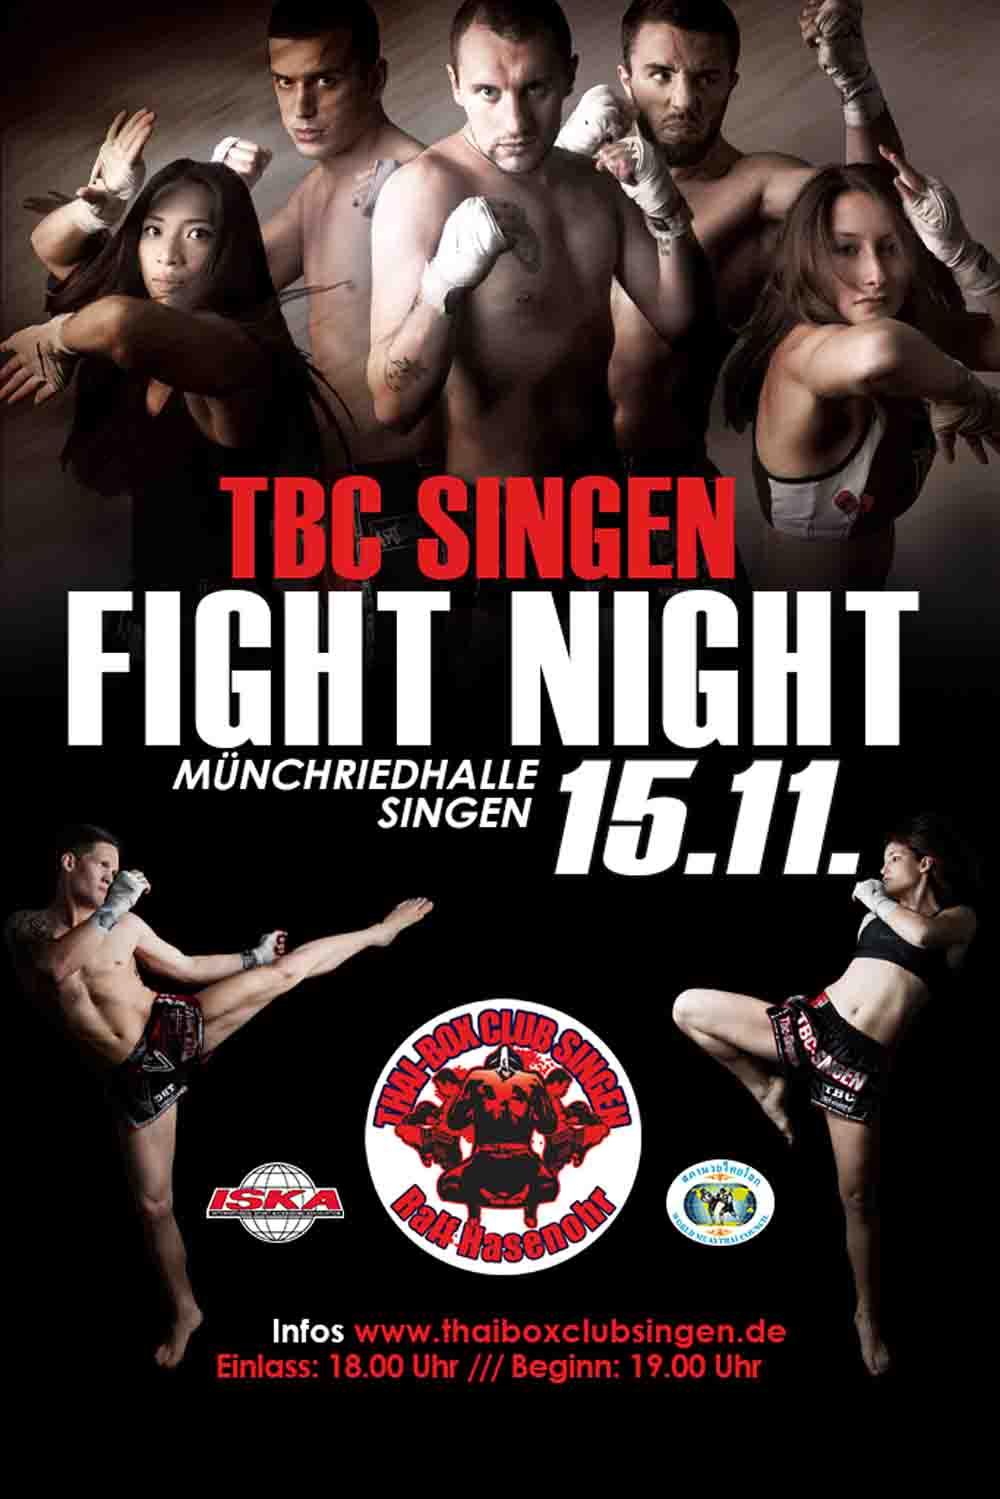 TBC SINGEN FIGHT NIGHT